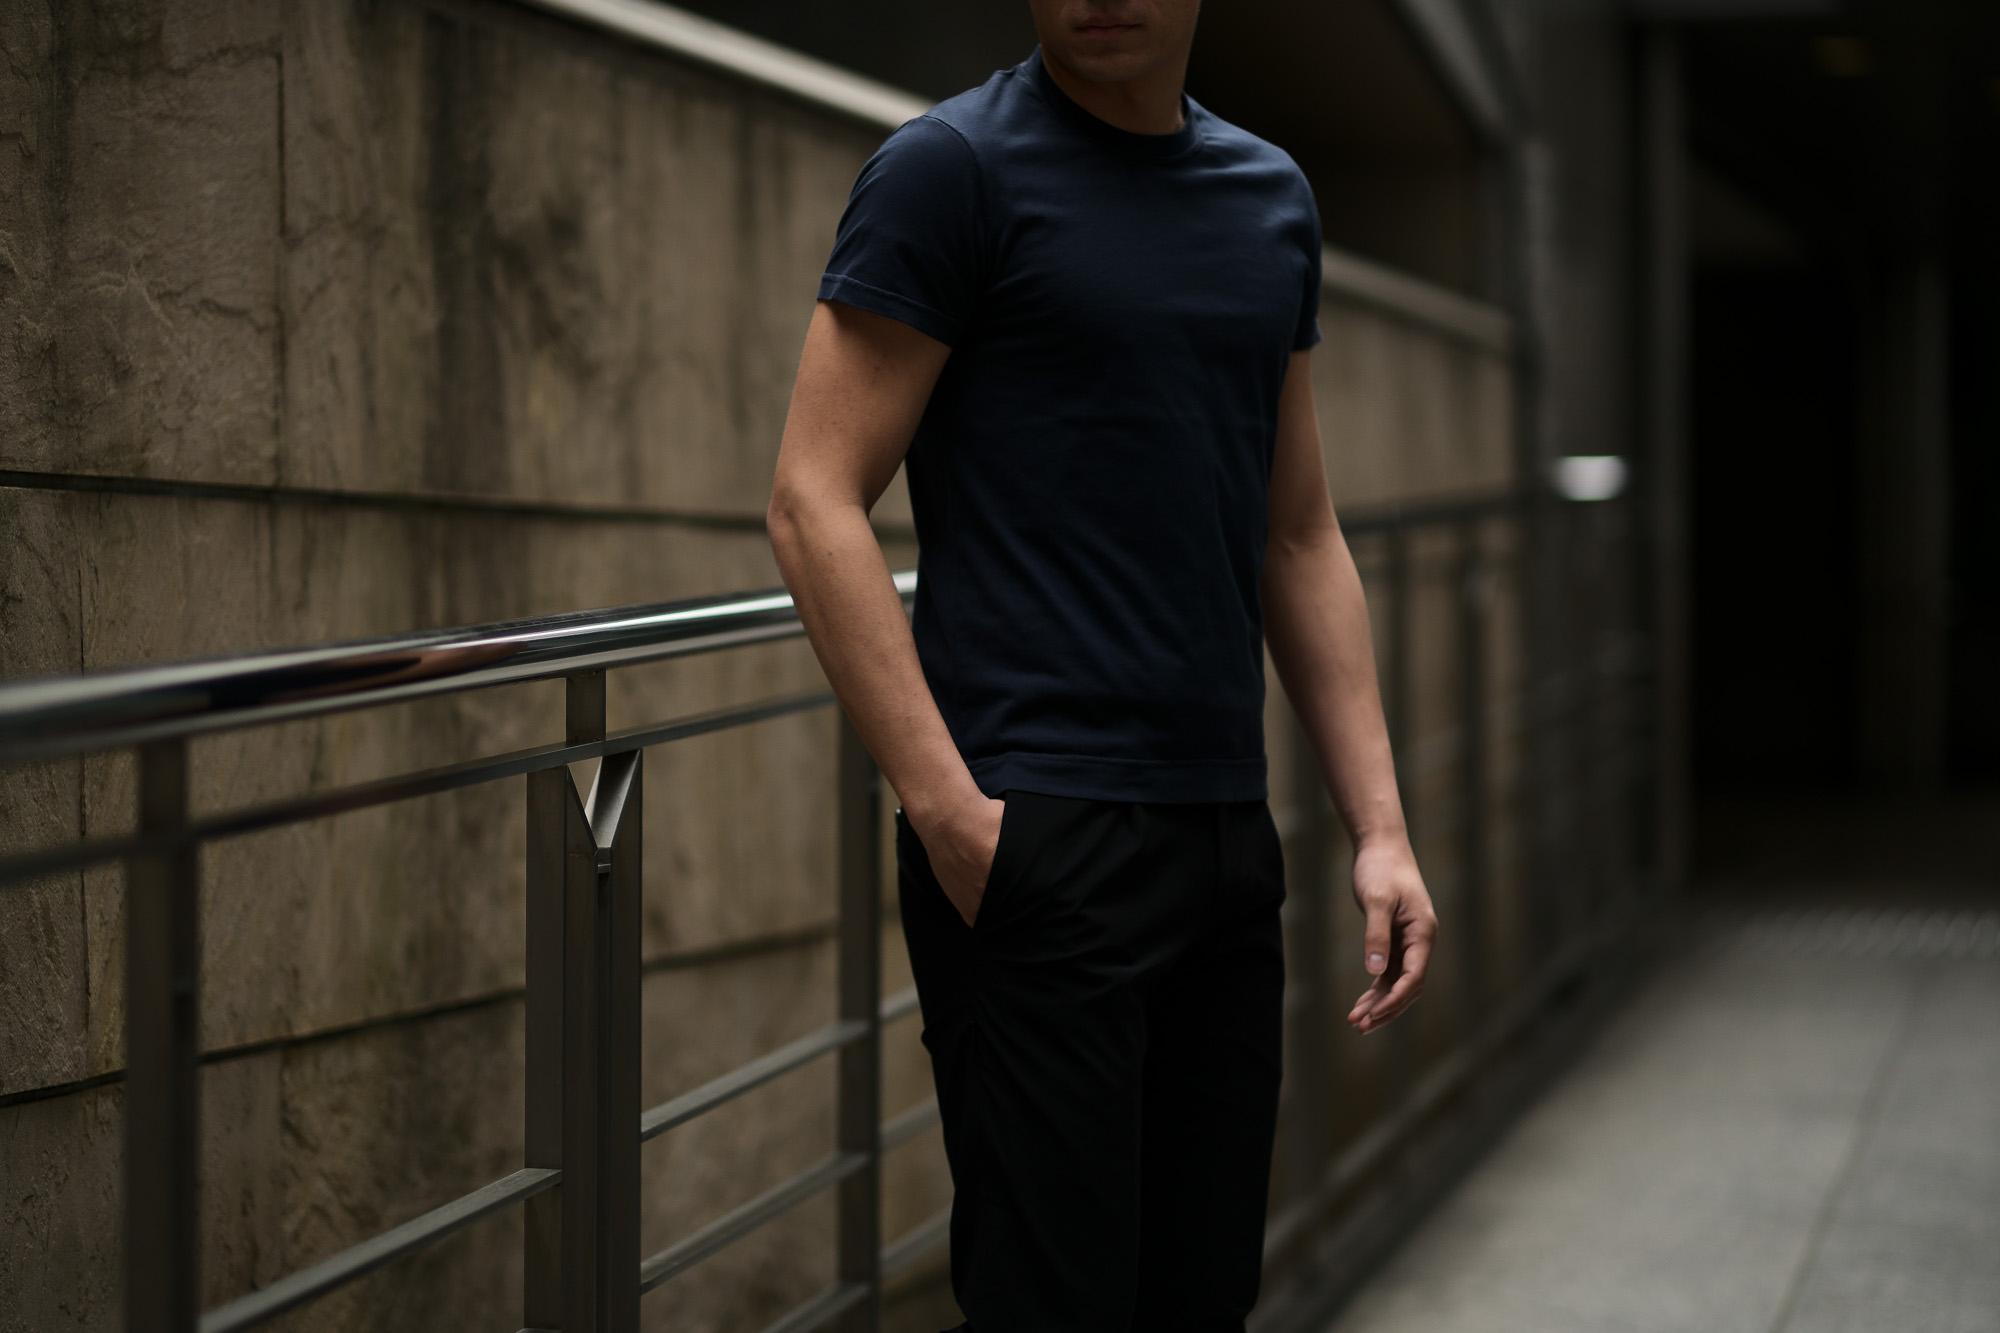 FEDELI (フェデーリ) Crew Neck T-shirt (クルーネック Tシャツ) ギザコットン Tシャツ NAVY (ネイビー・626) made in italy (イタリア製) 2019 春夏新作 愛知 名古屋 altoediritto アルトエデリット